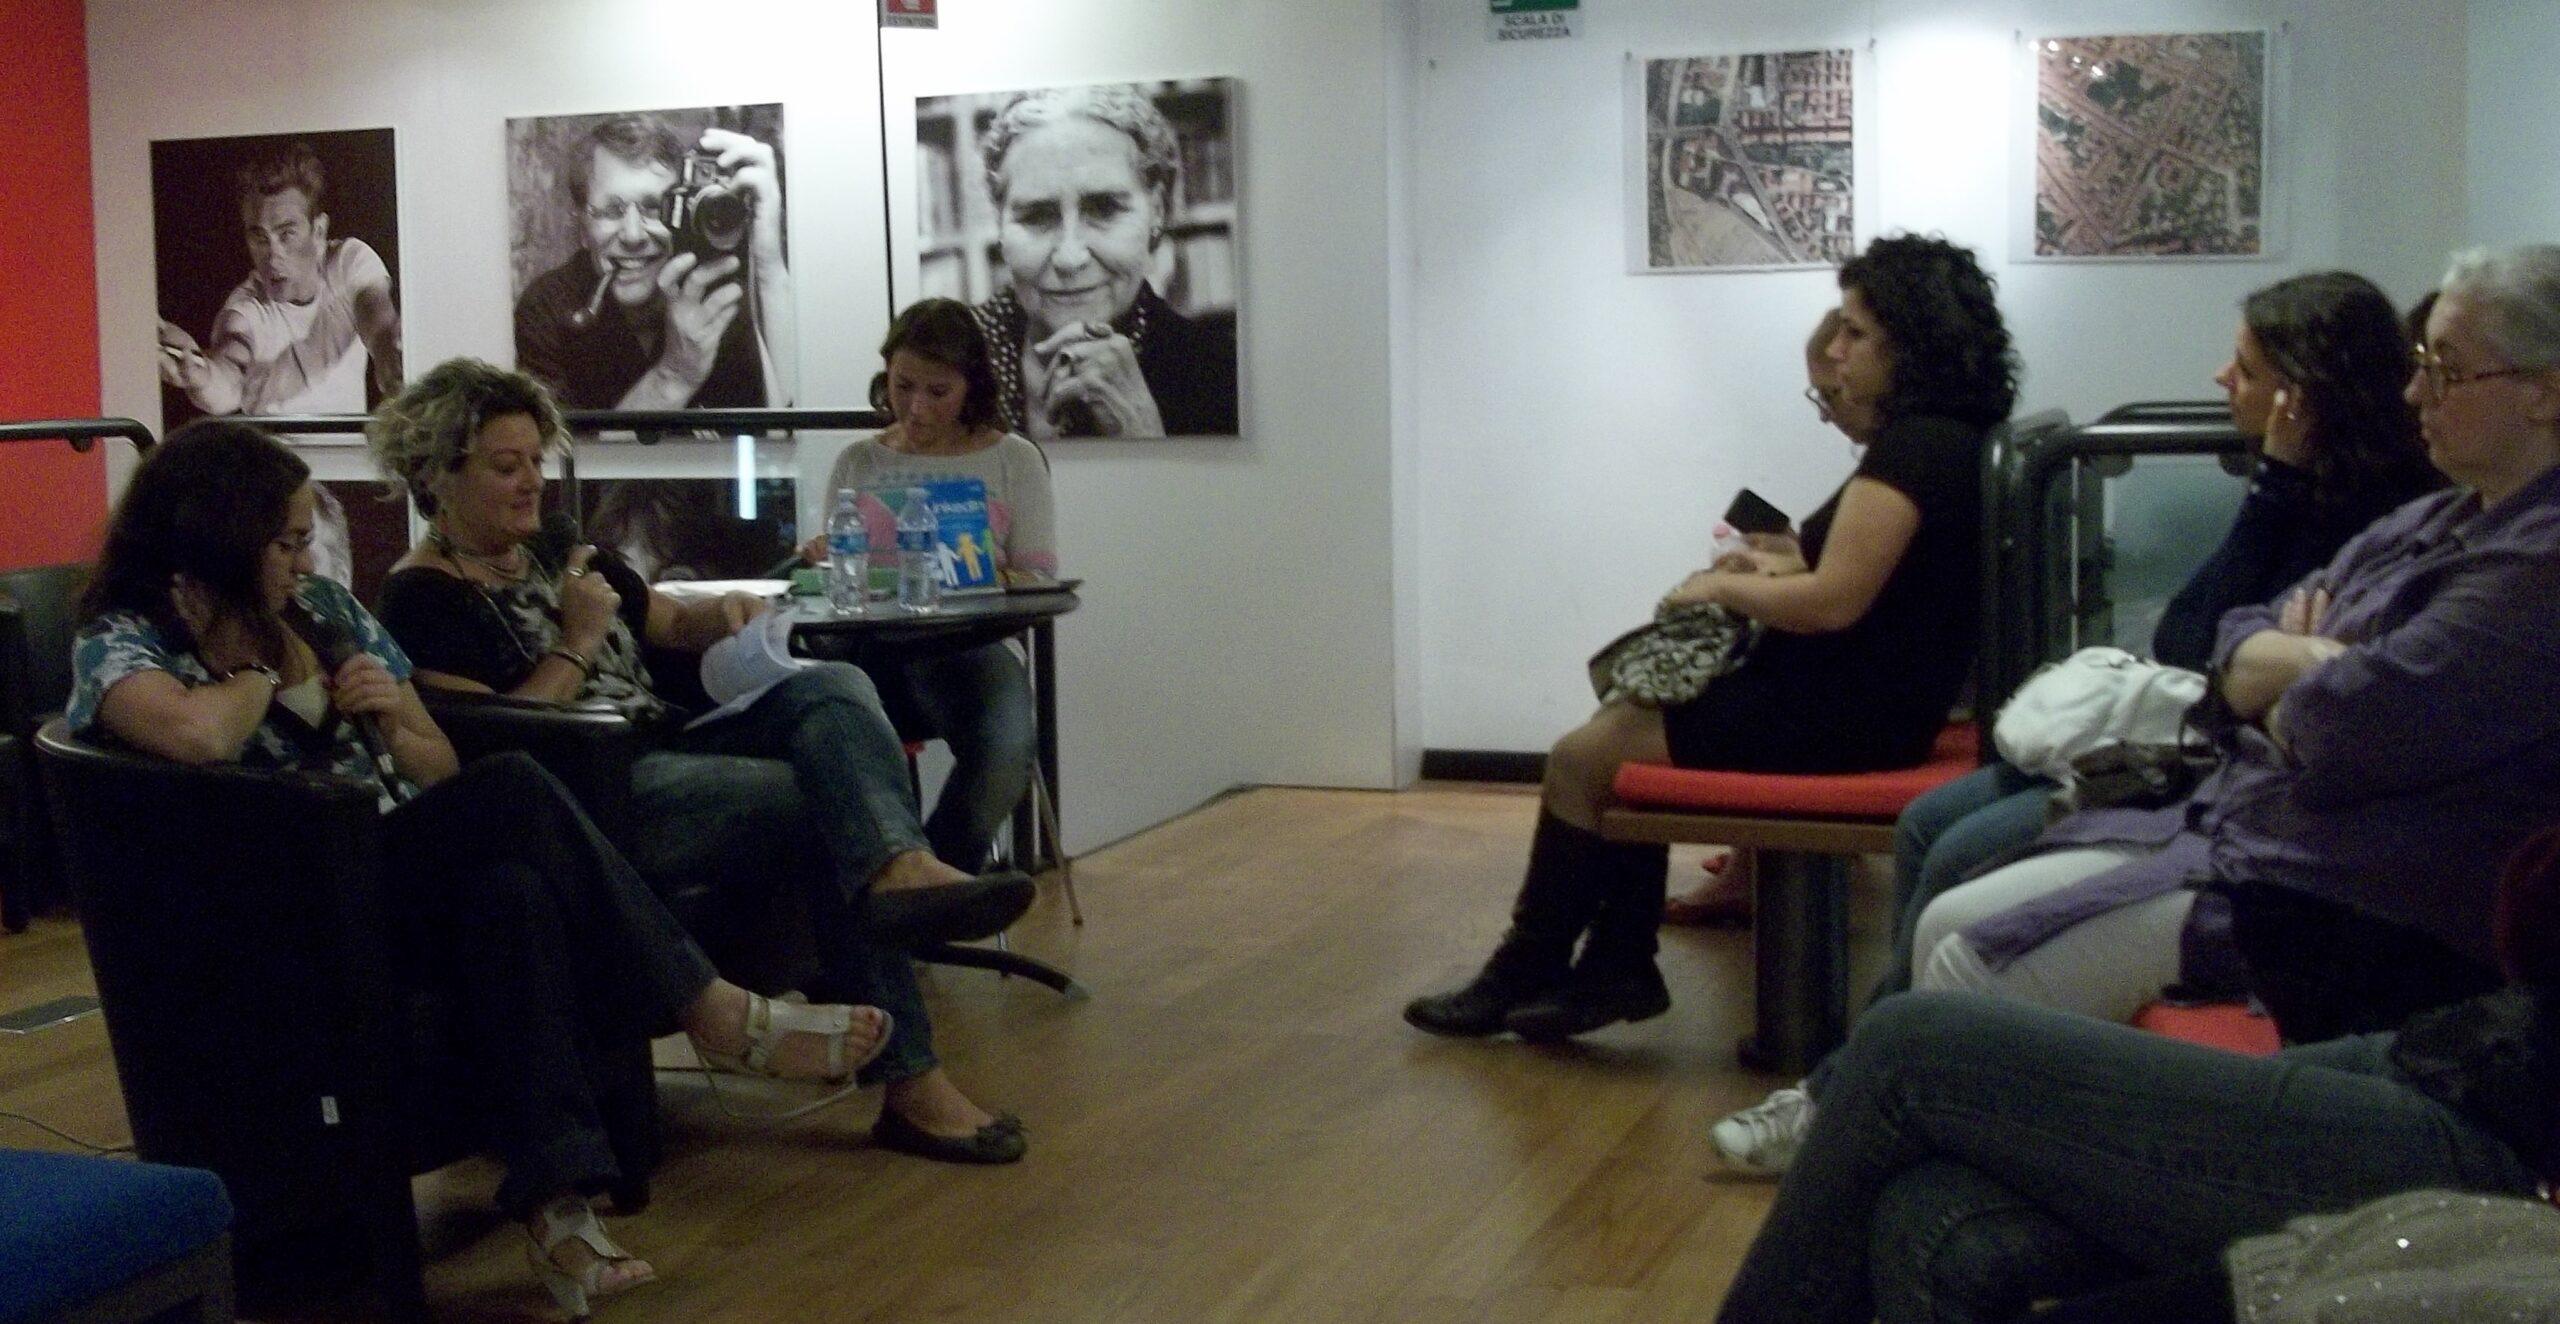 Geek Books: letteratura e tecnologia, con le Girl Geek Dinners Bologna